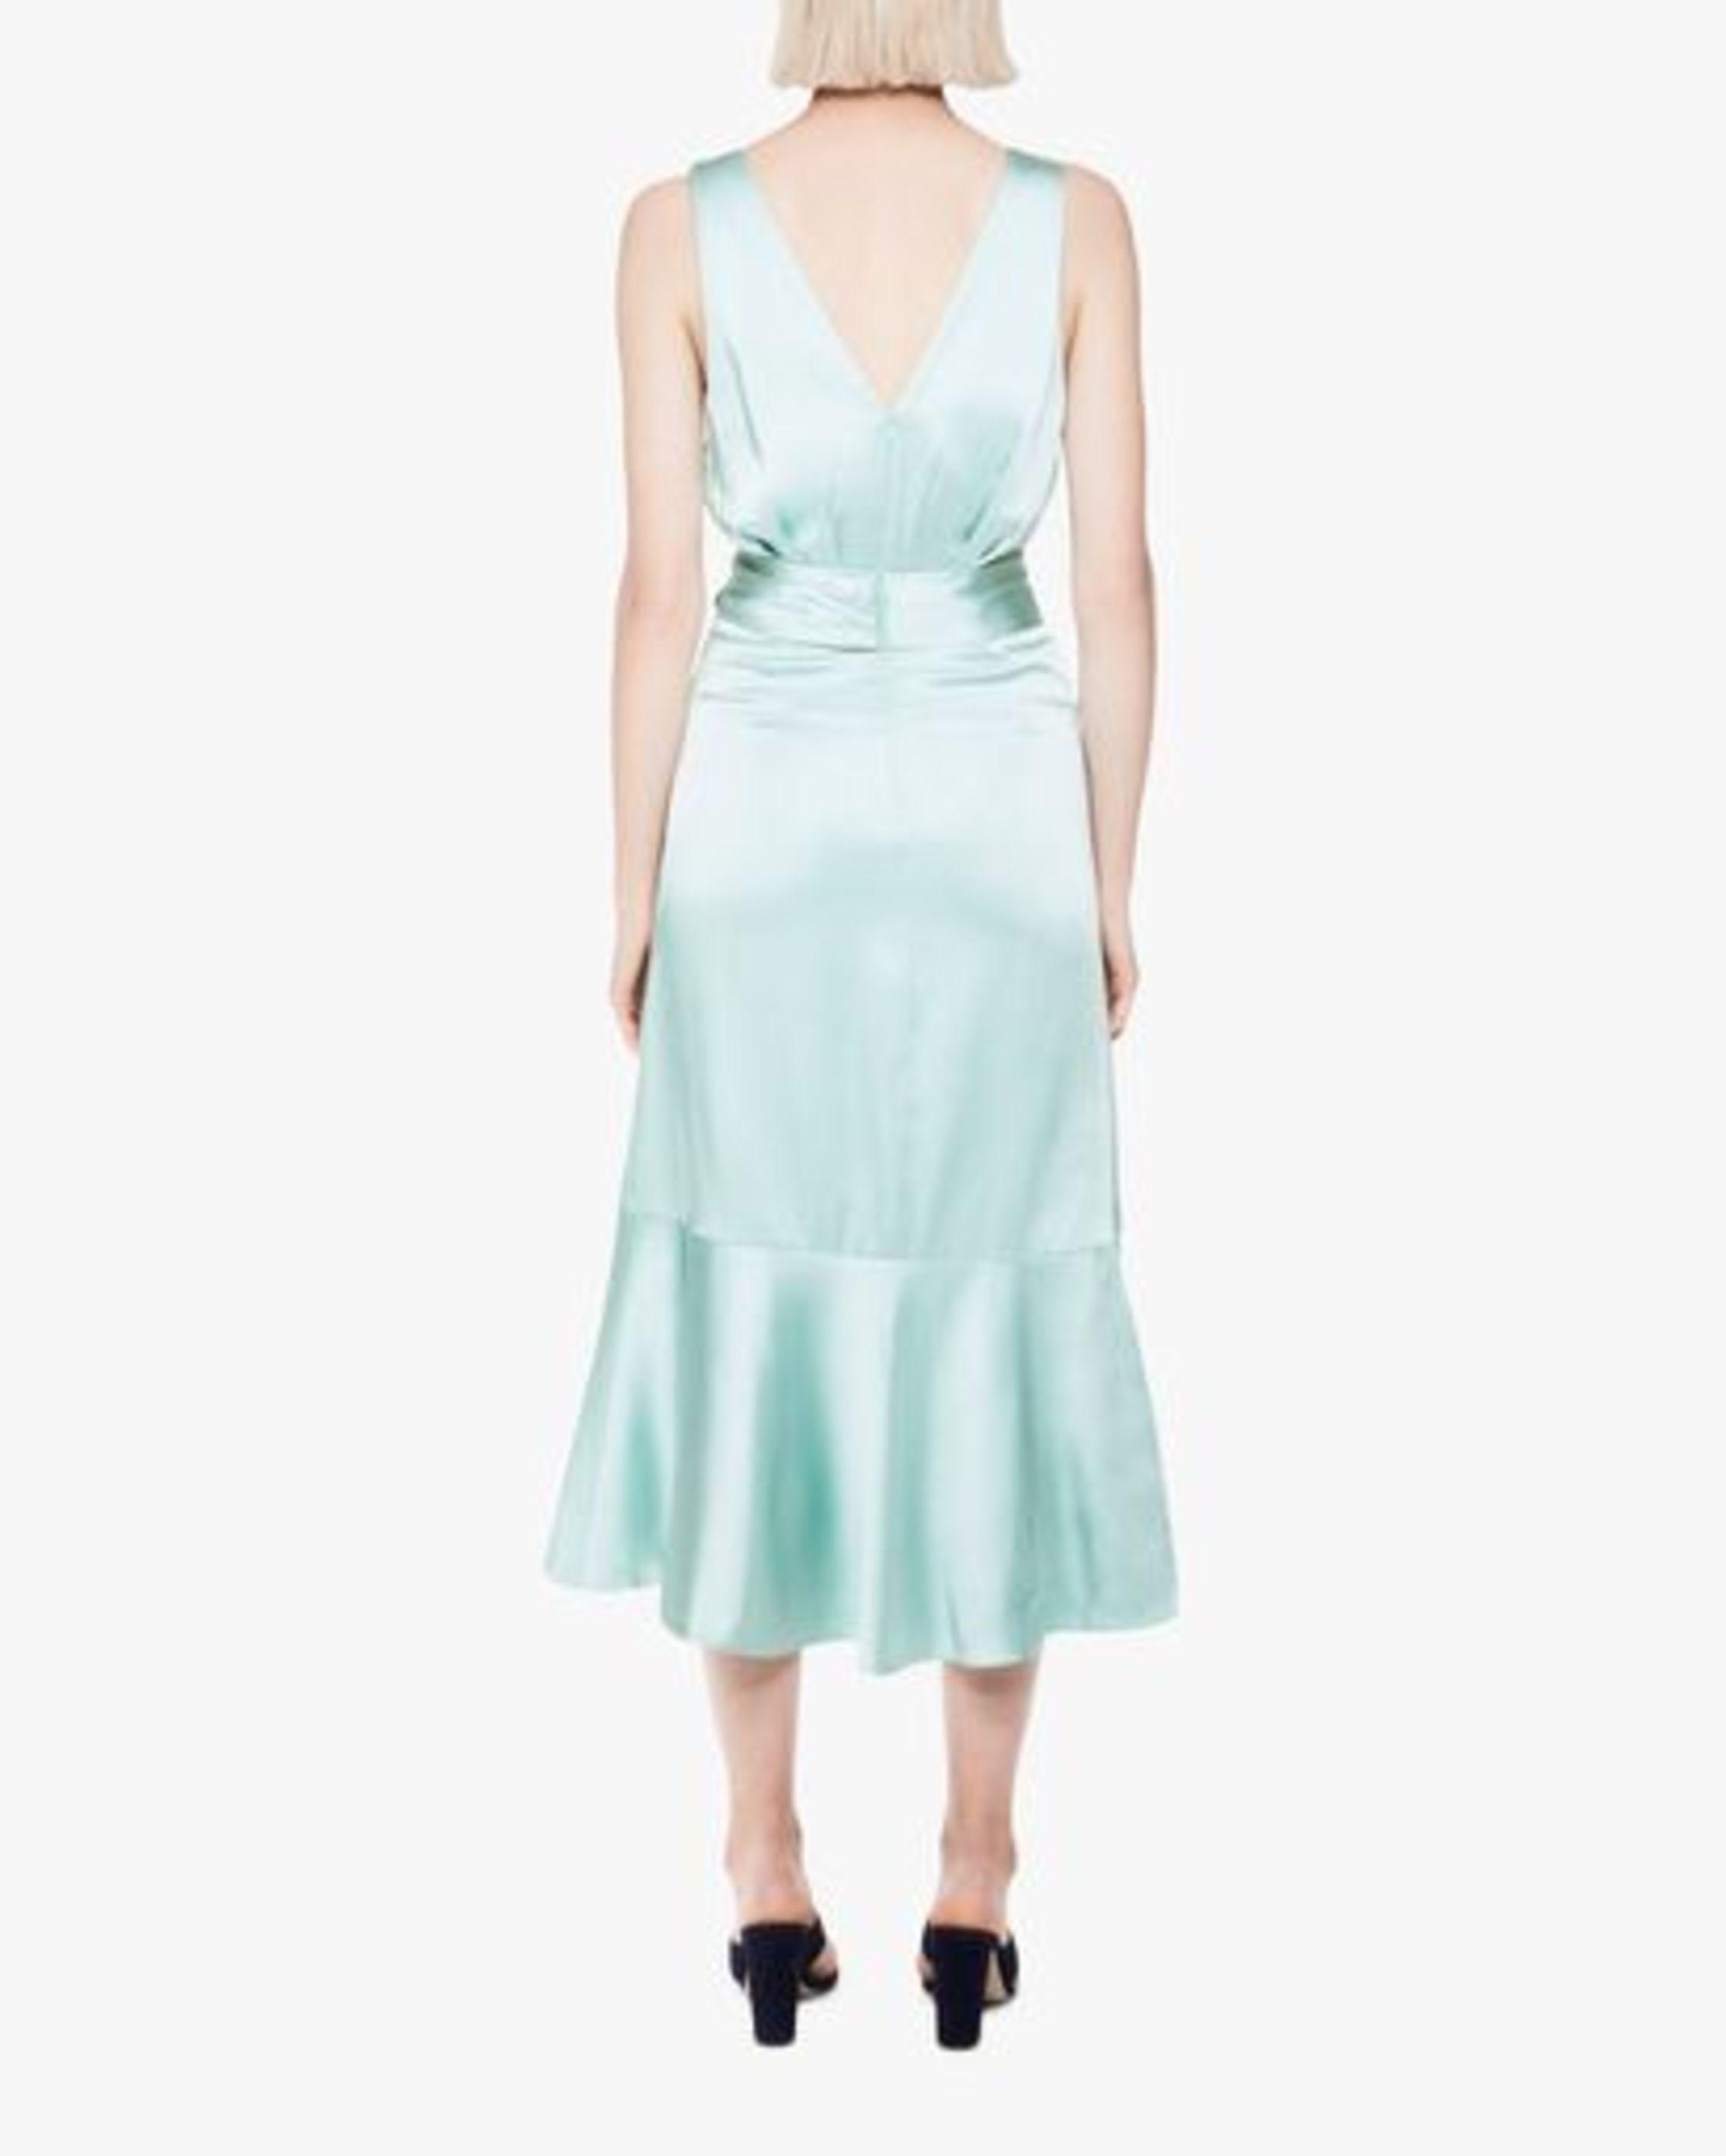 Jonathan Simkhai Mia Fluid Satin Maxi Dress 1